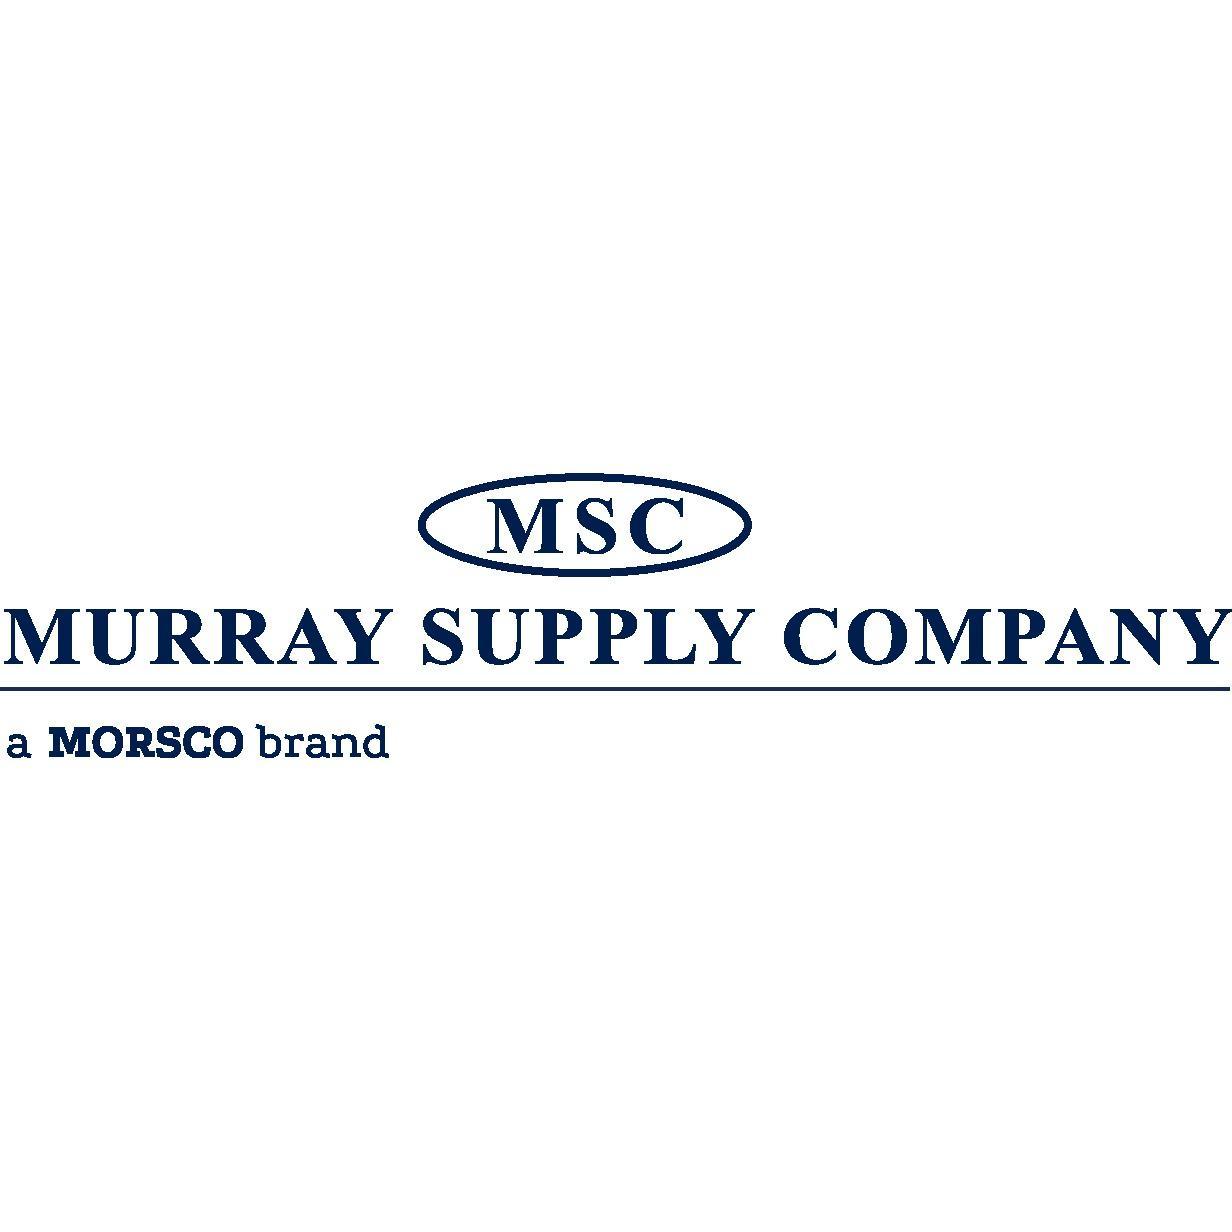 Murray Supply